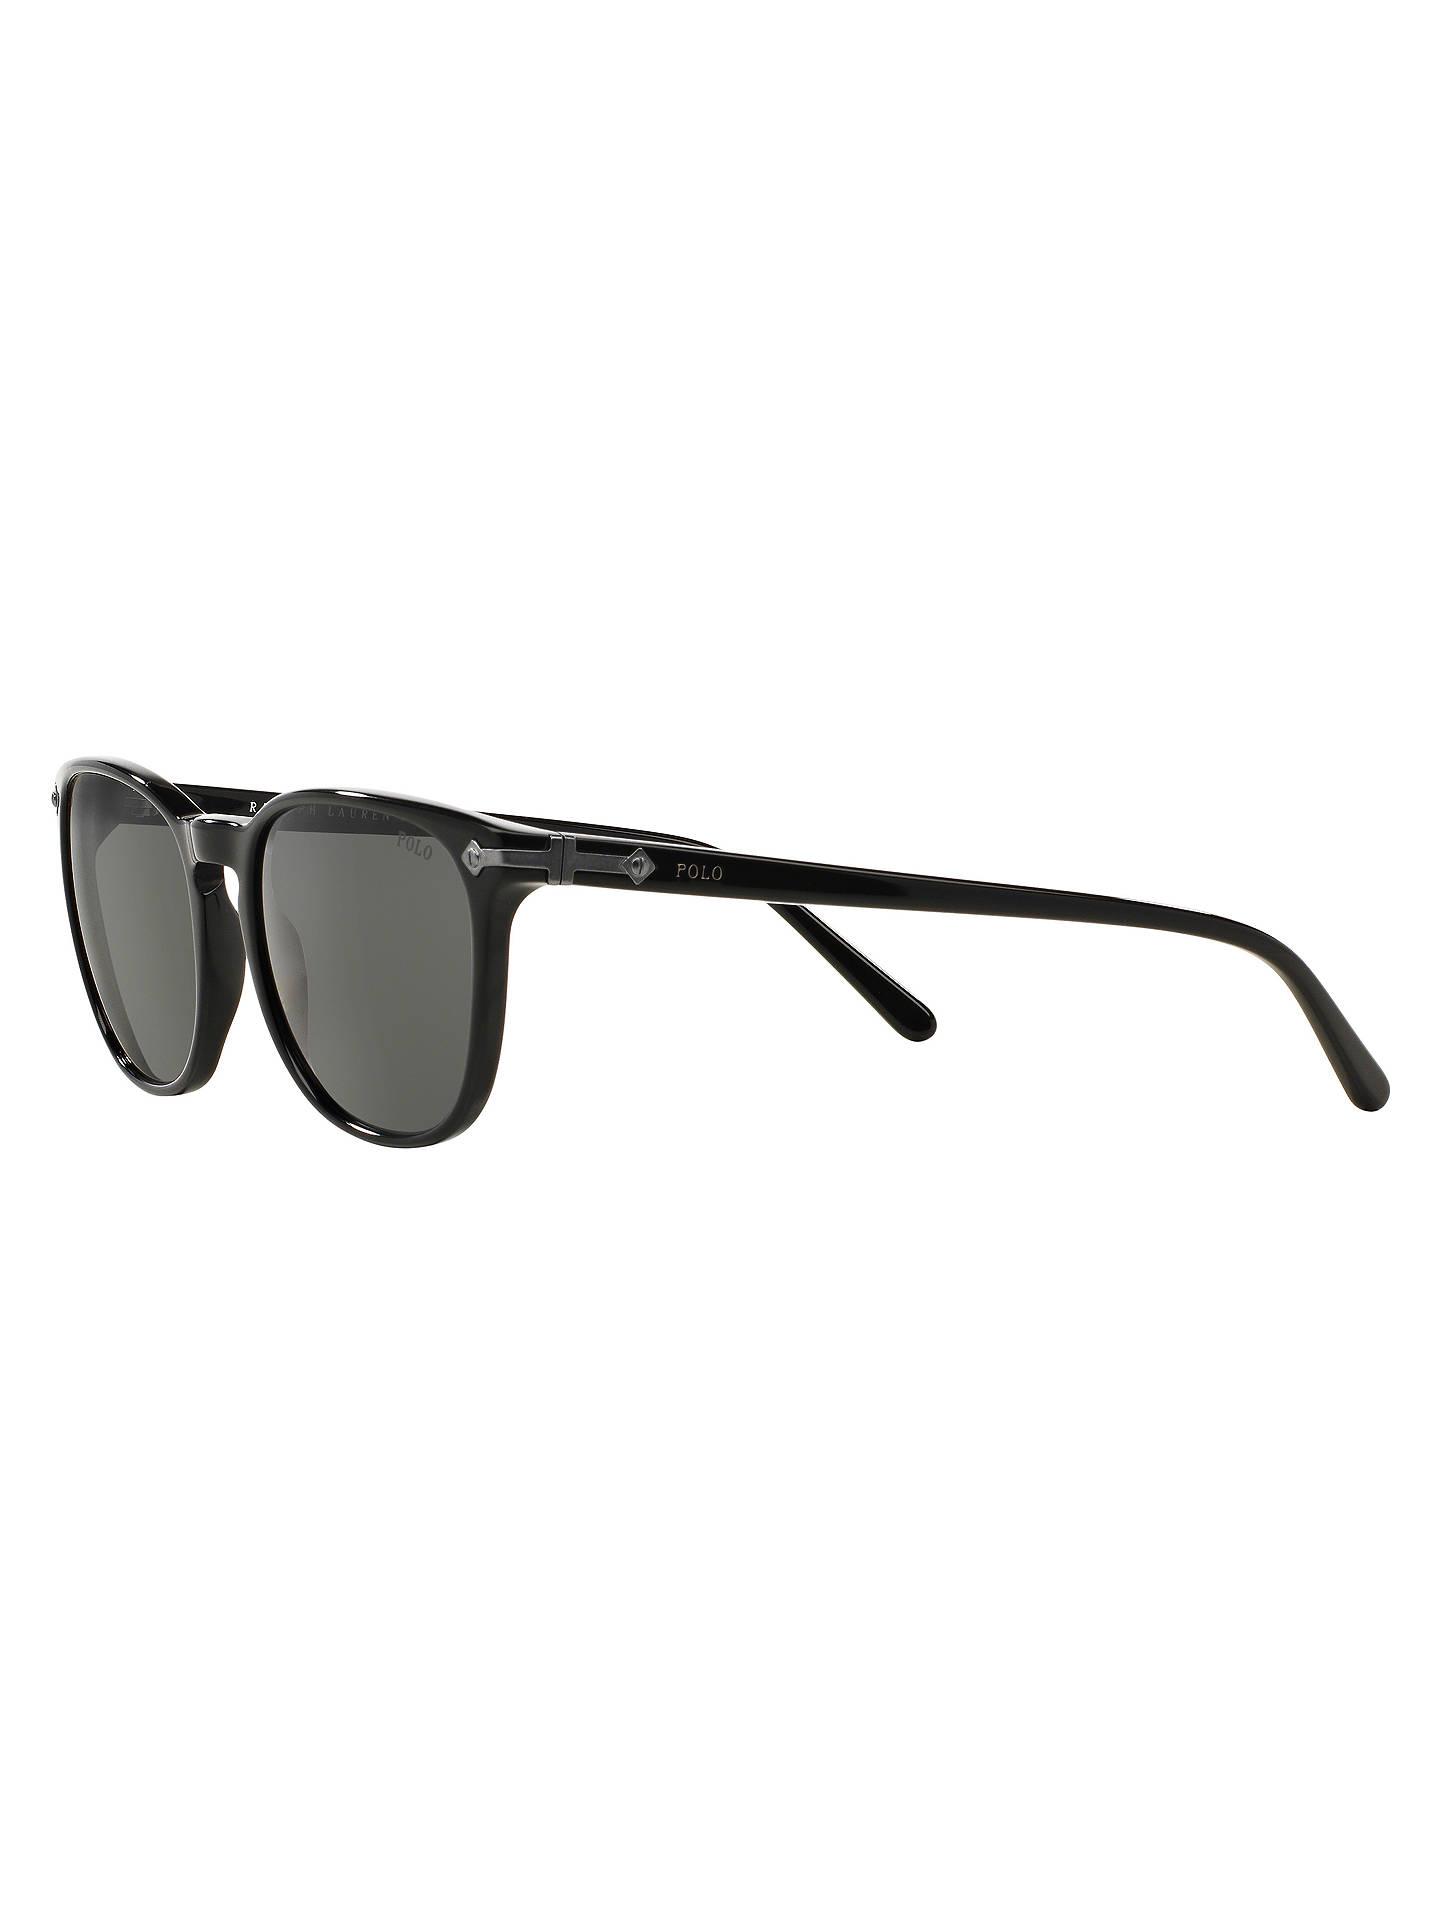 9ee040a9b16a ... Buy Polo Ralph Lauren PH4107 Phantos Oval Sunglasses, Black Online at  johnlewis.com ...